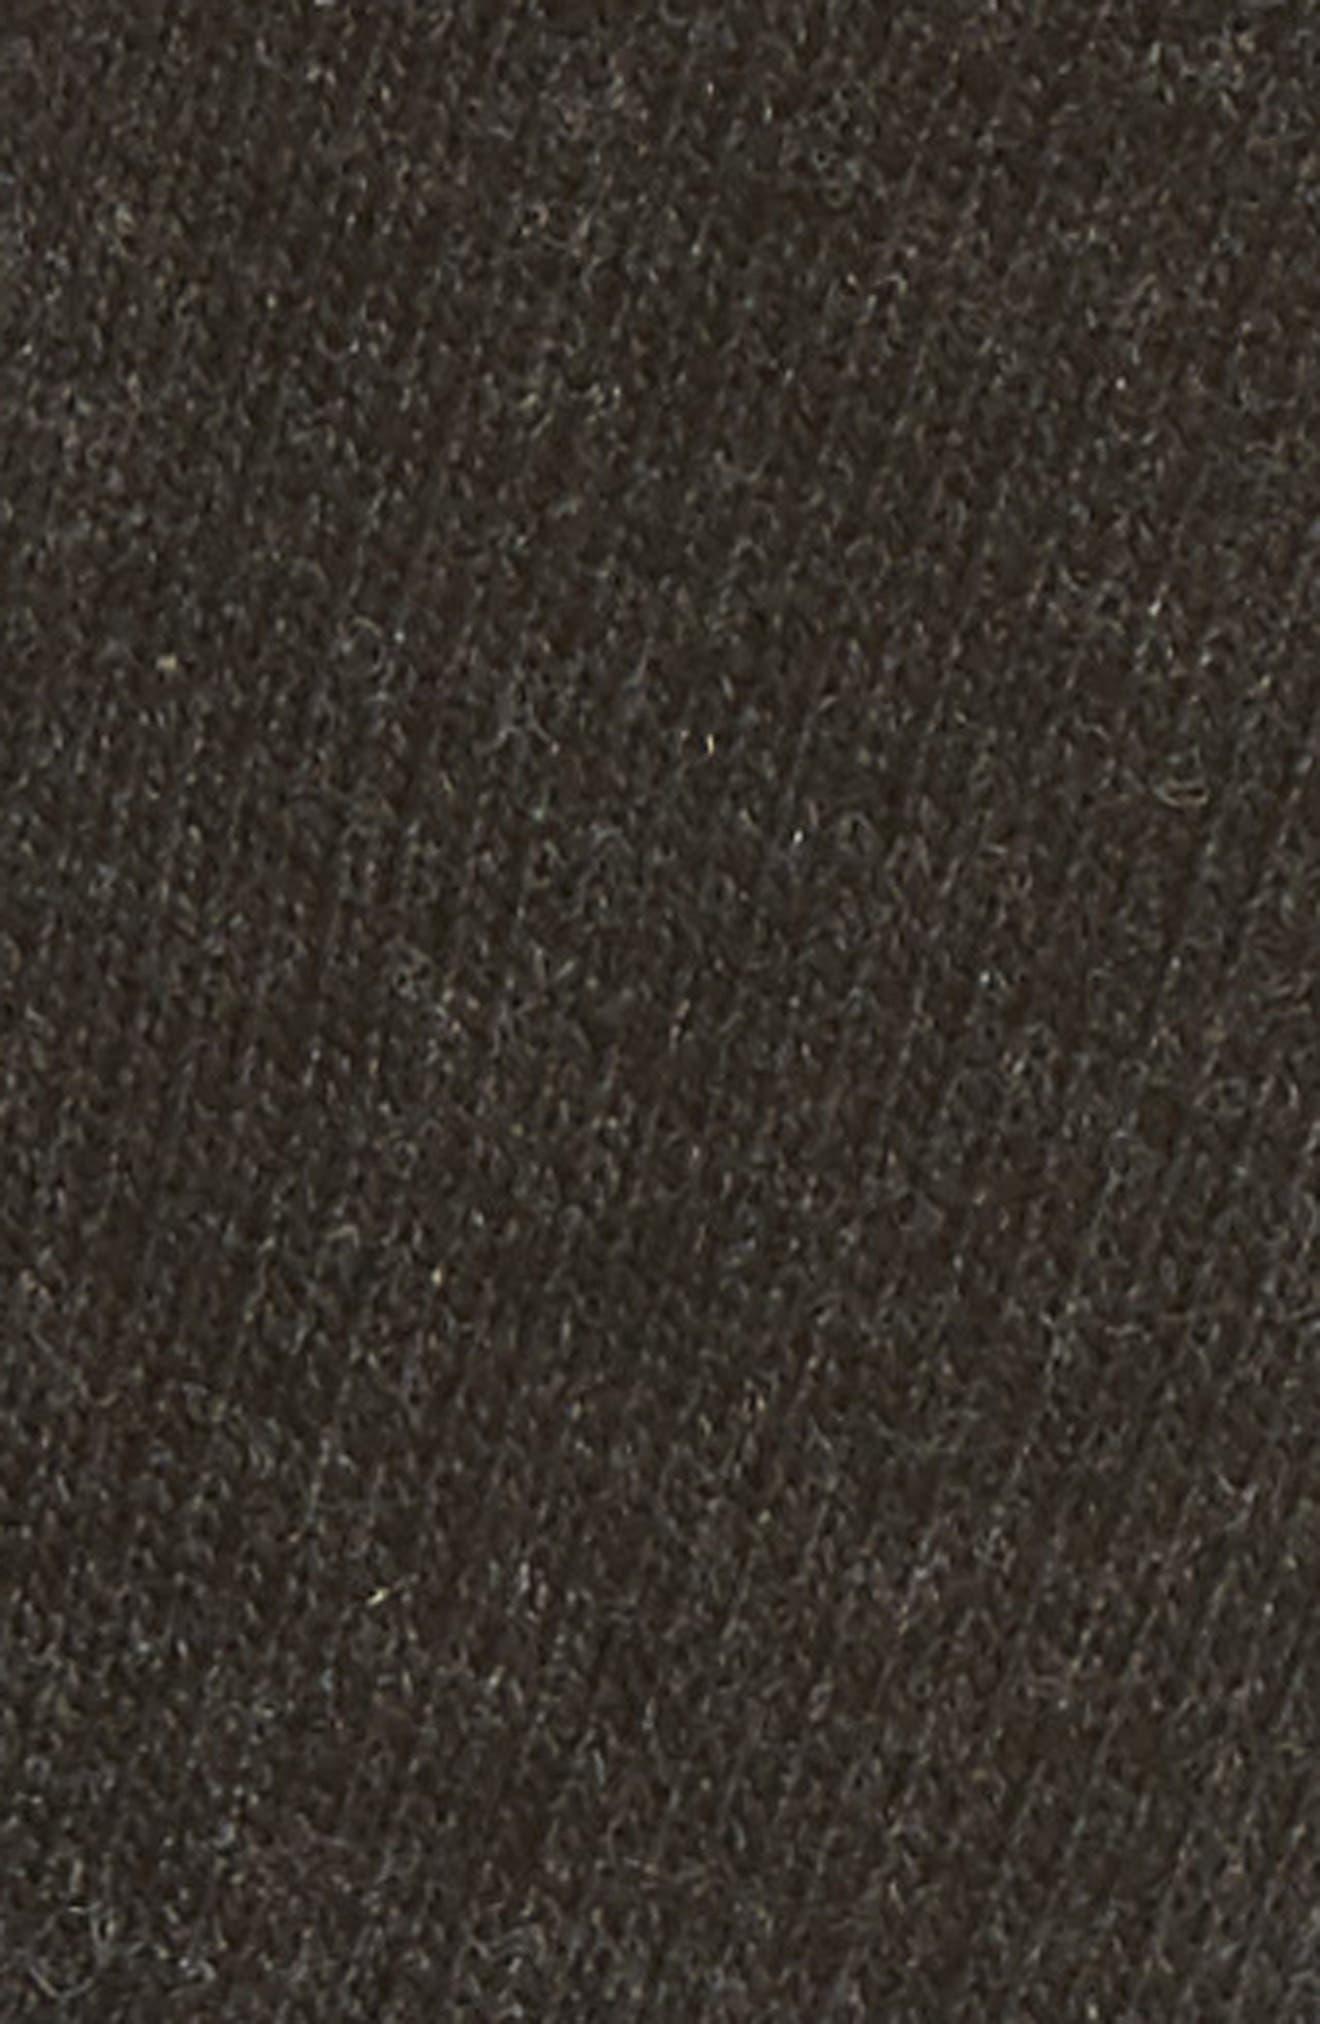 Cosy Crew Socks,                             Alternate thumbnail 10, color,